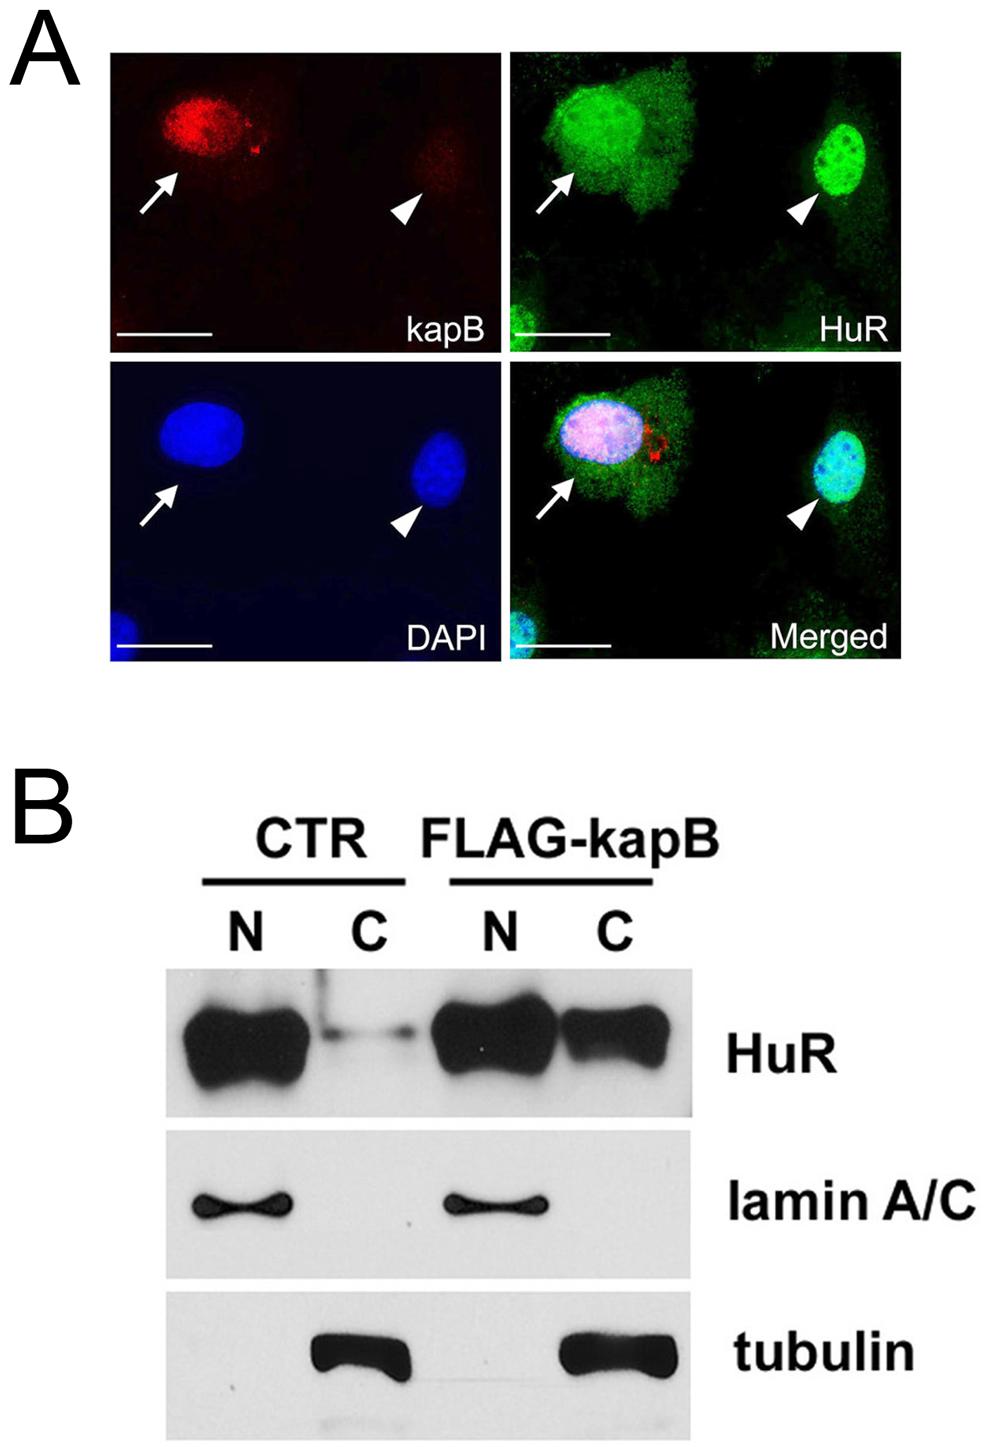 Cytoplasmic accumulation of HuR protein by kaposin-B.